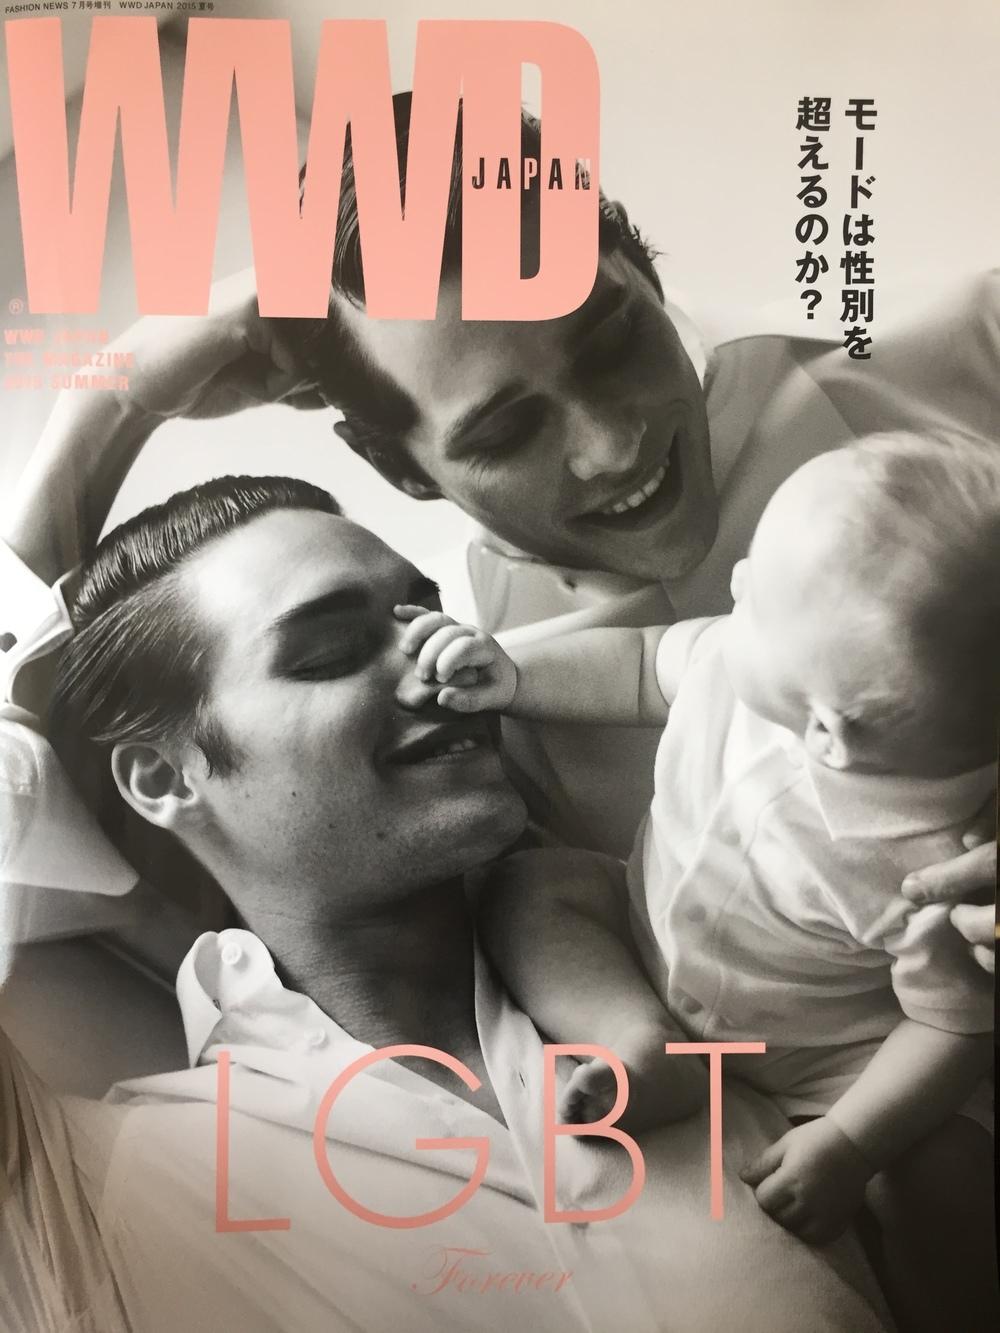 WWD Japan - LGBT...JPG